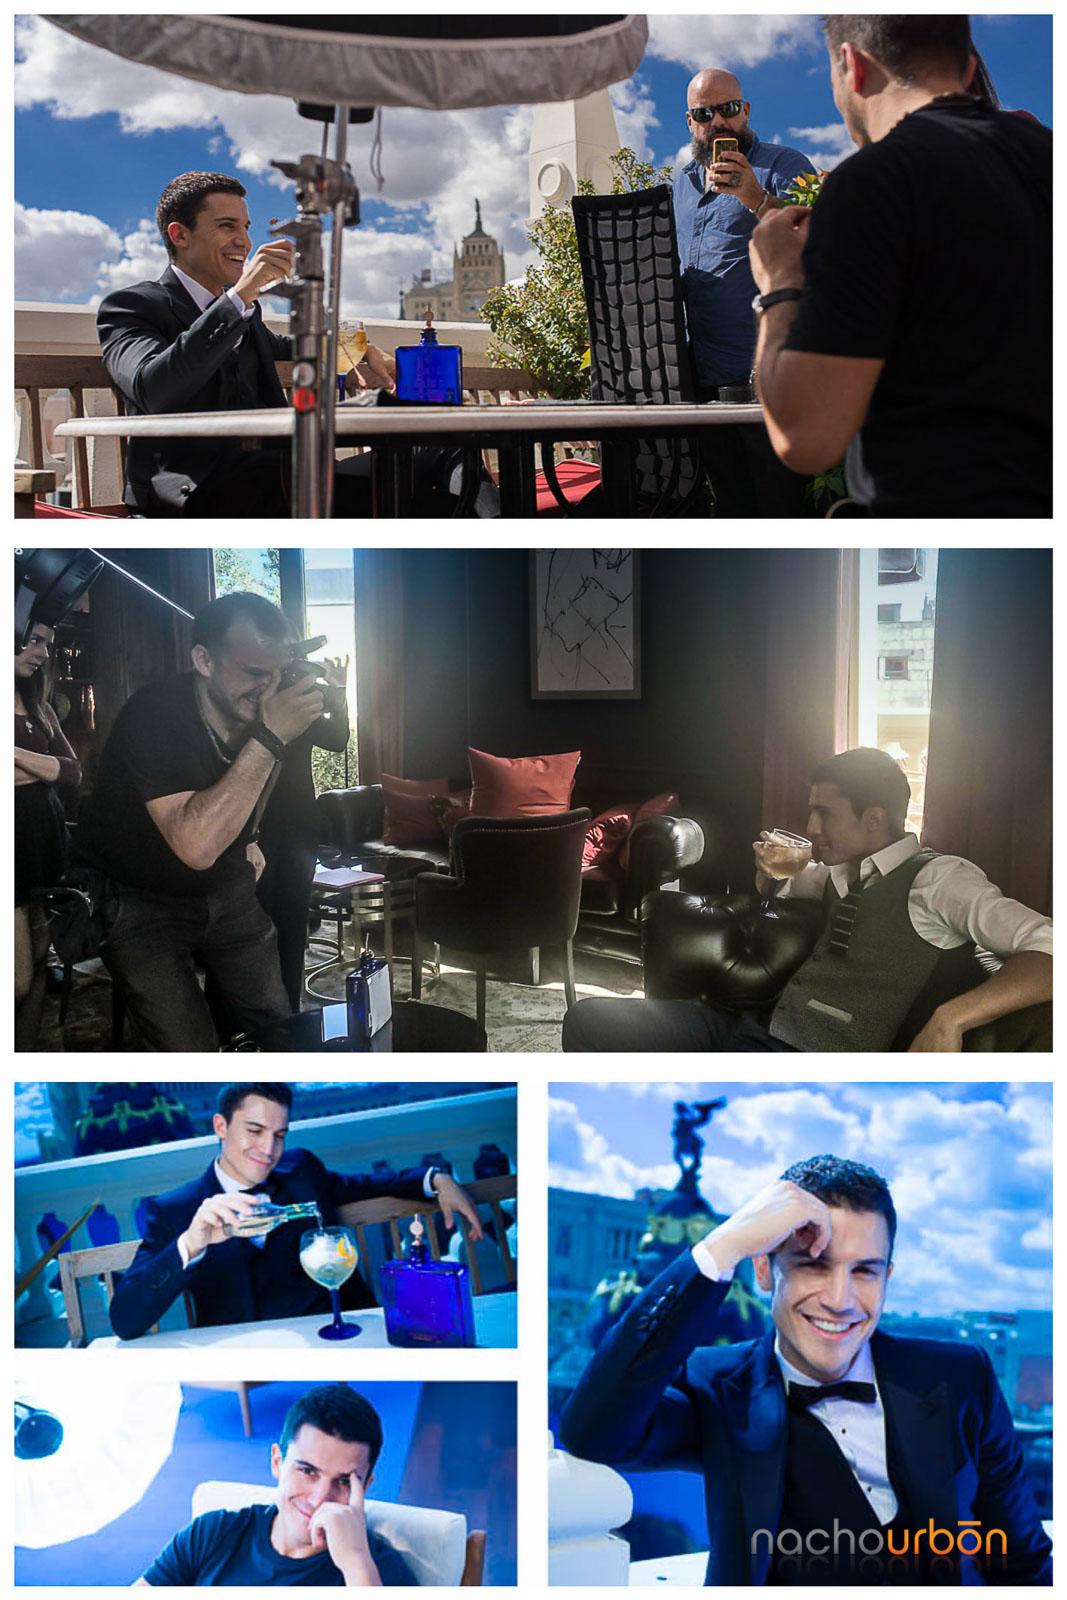 01-nacho-urbon-nachourbon-automovil-DIAGEO-Alex-Gonzalez-actor-retrato-fotografia-fotografo-madrid-profesional-publicidad-corporate-portrait-mejor-modelo-patrocinio